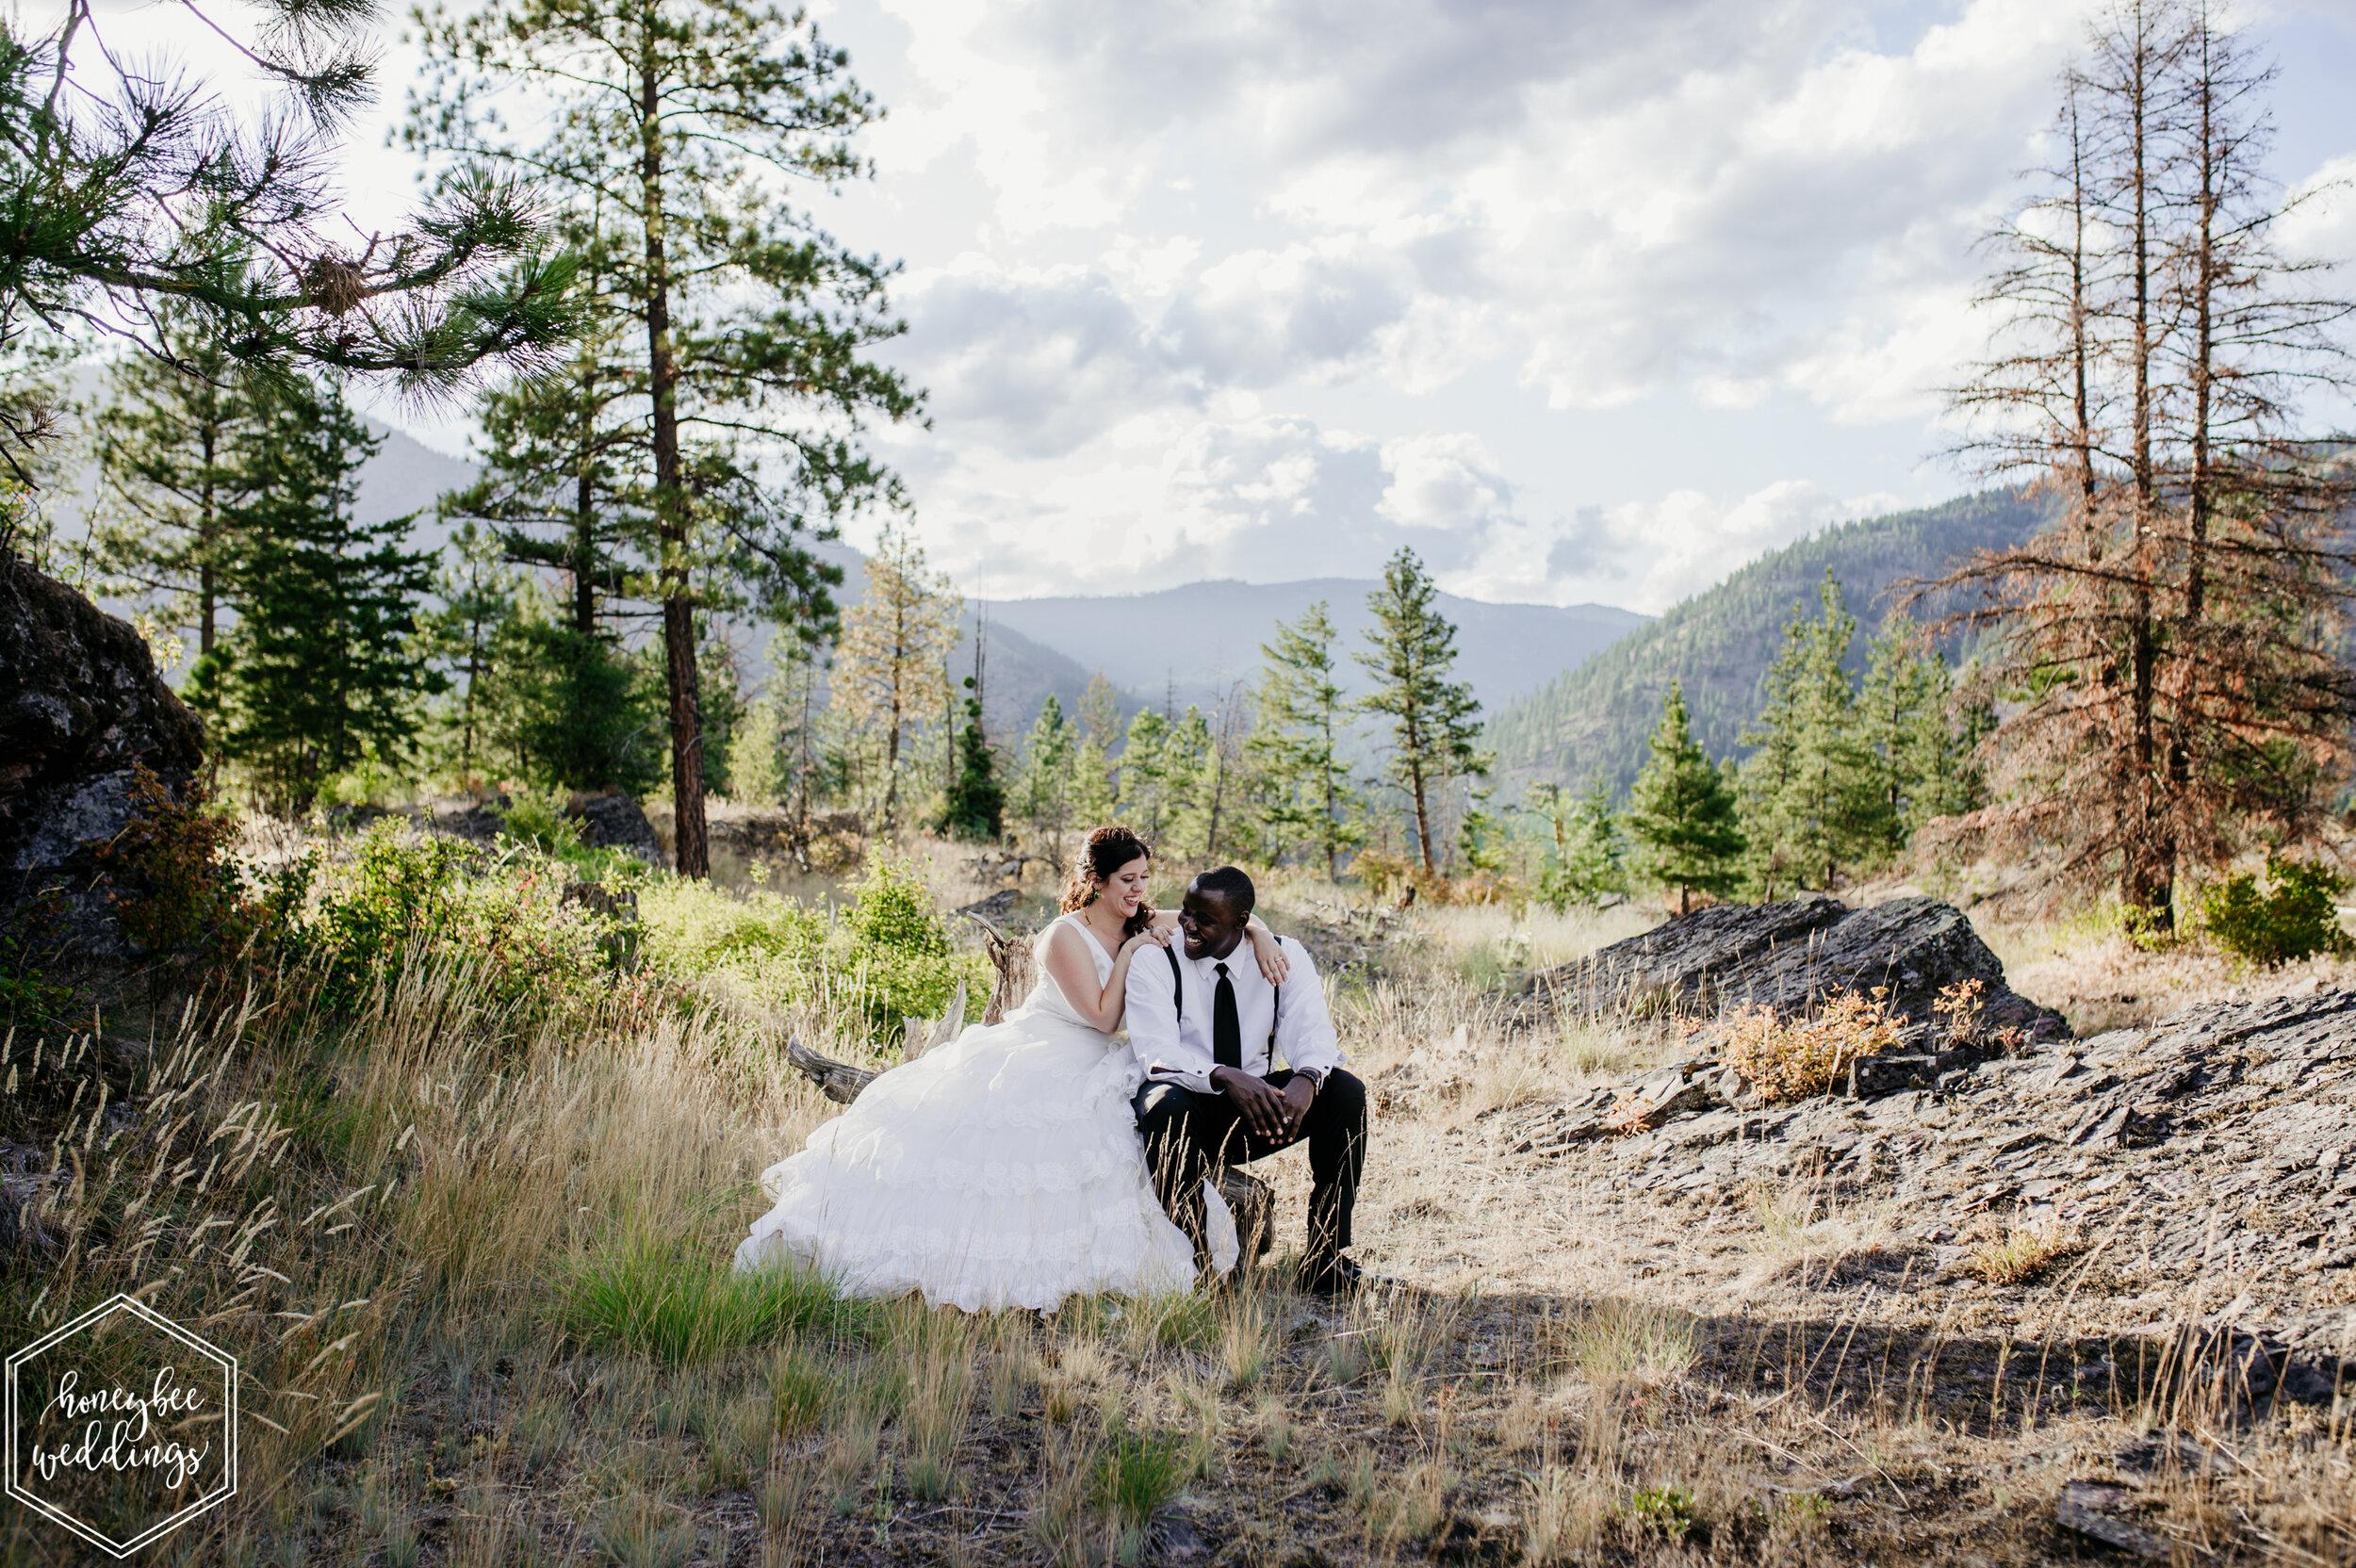 007White Raven Wedding_Montana Wedding Photographer_Rebekah & Likom_July 27, 2019-5.jpg